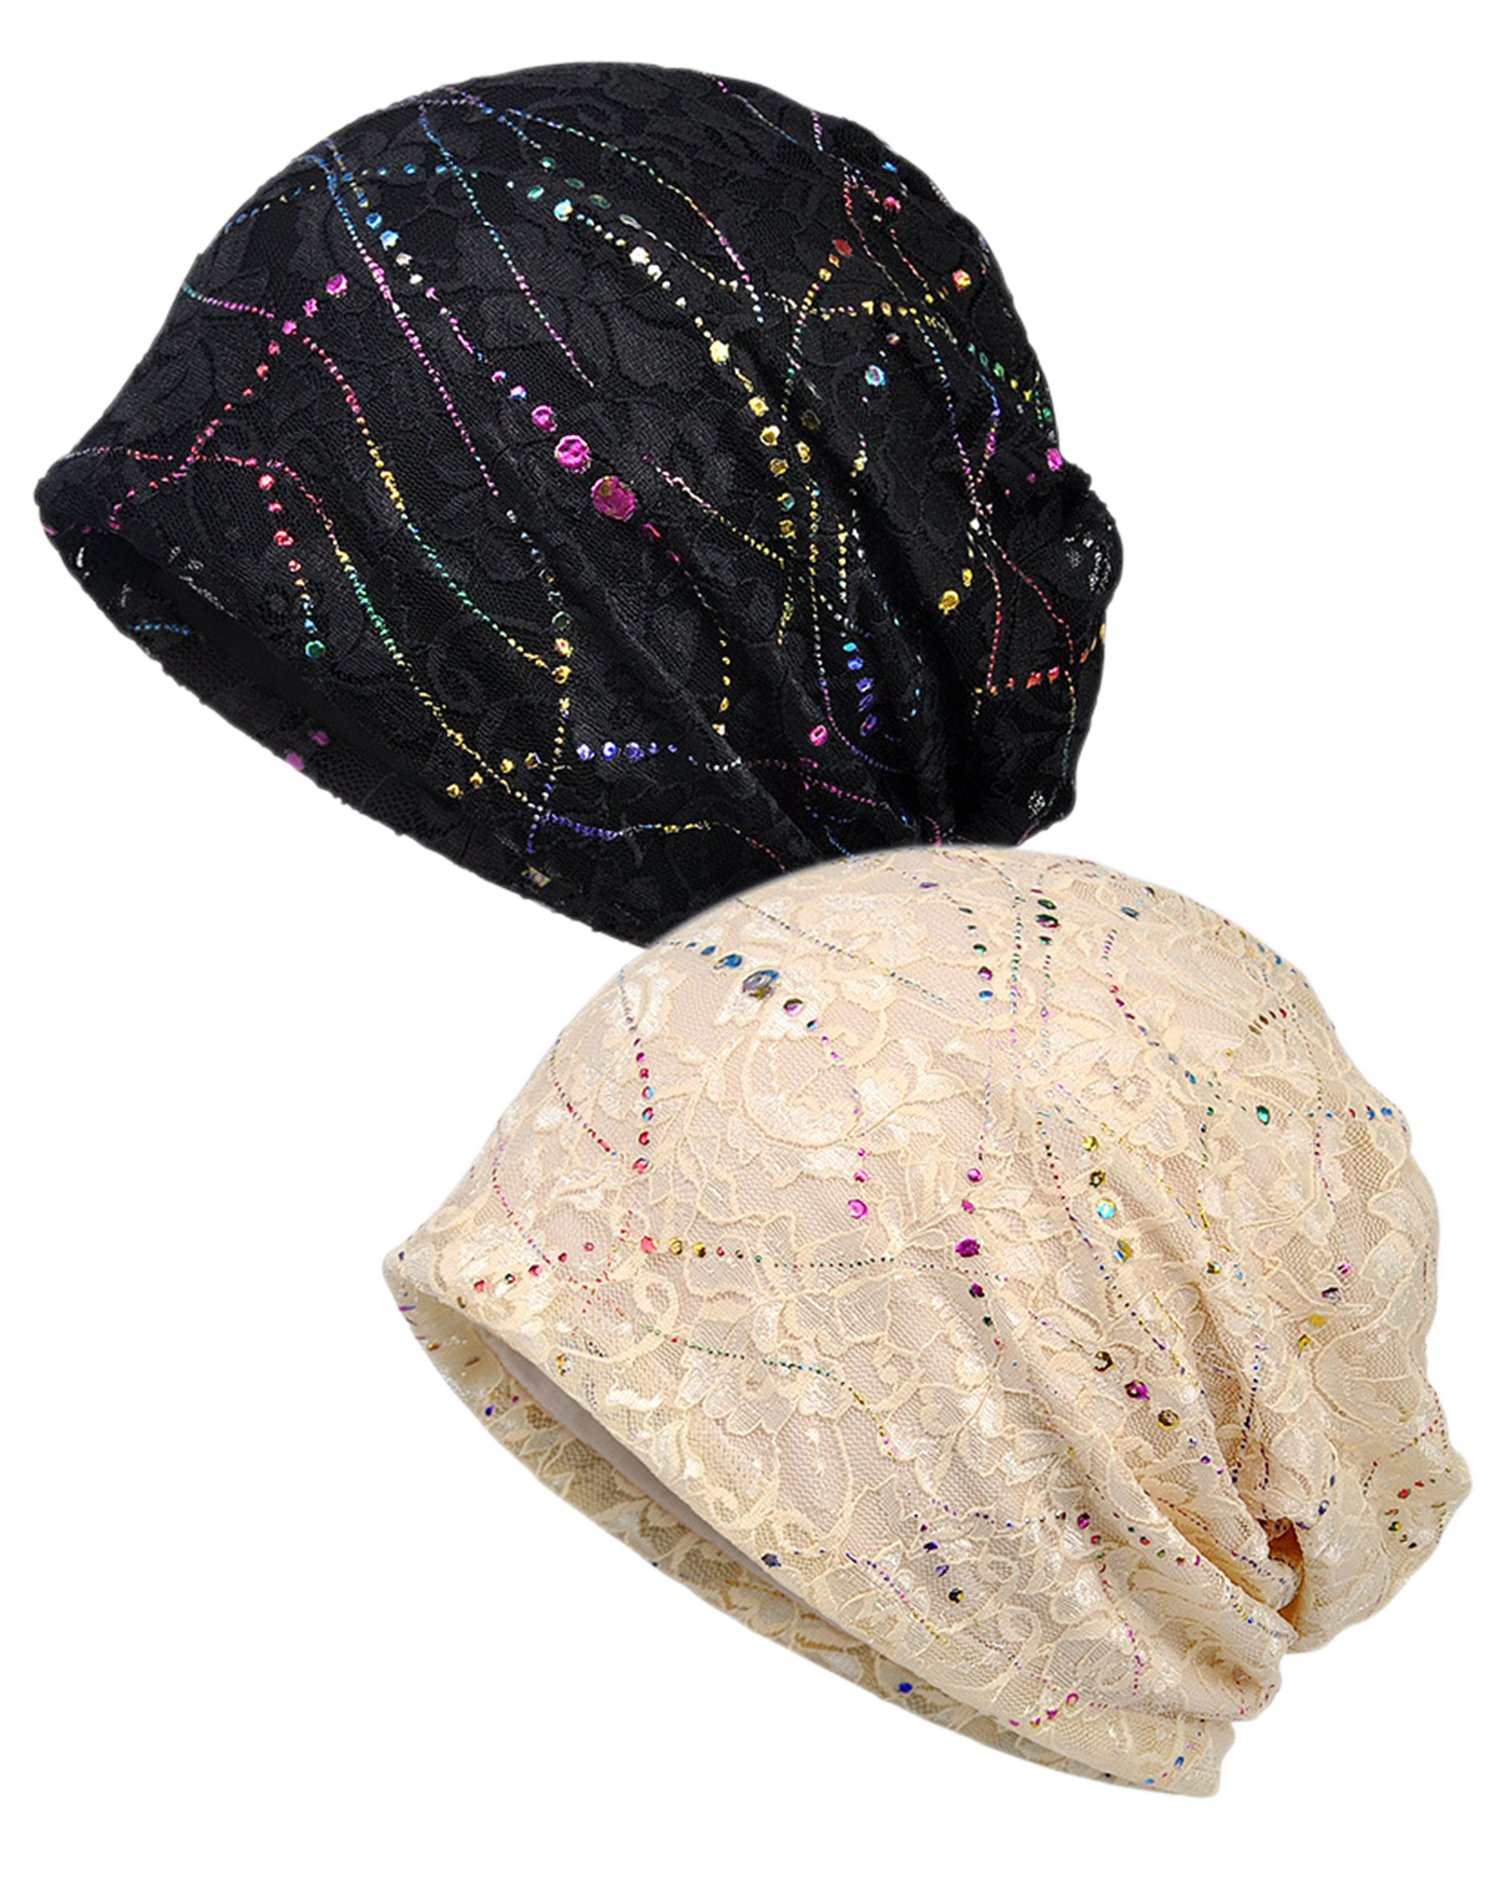 Luccy K Women's Lightweight Turban Slouchy Beanie Hat Cap (Black Beige)